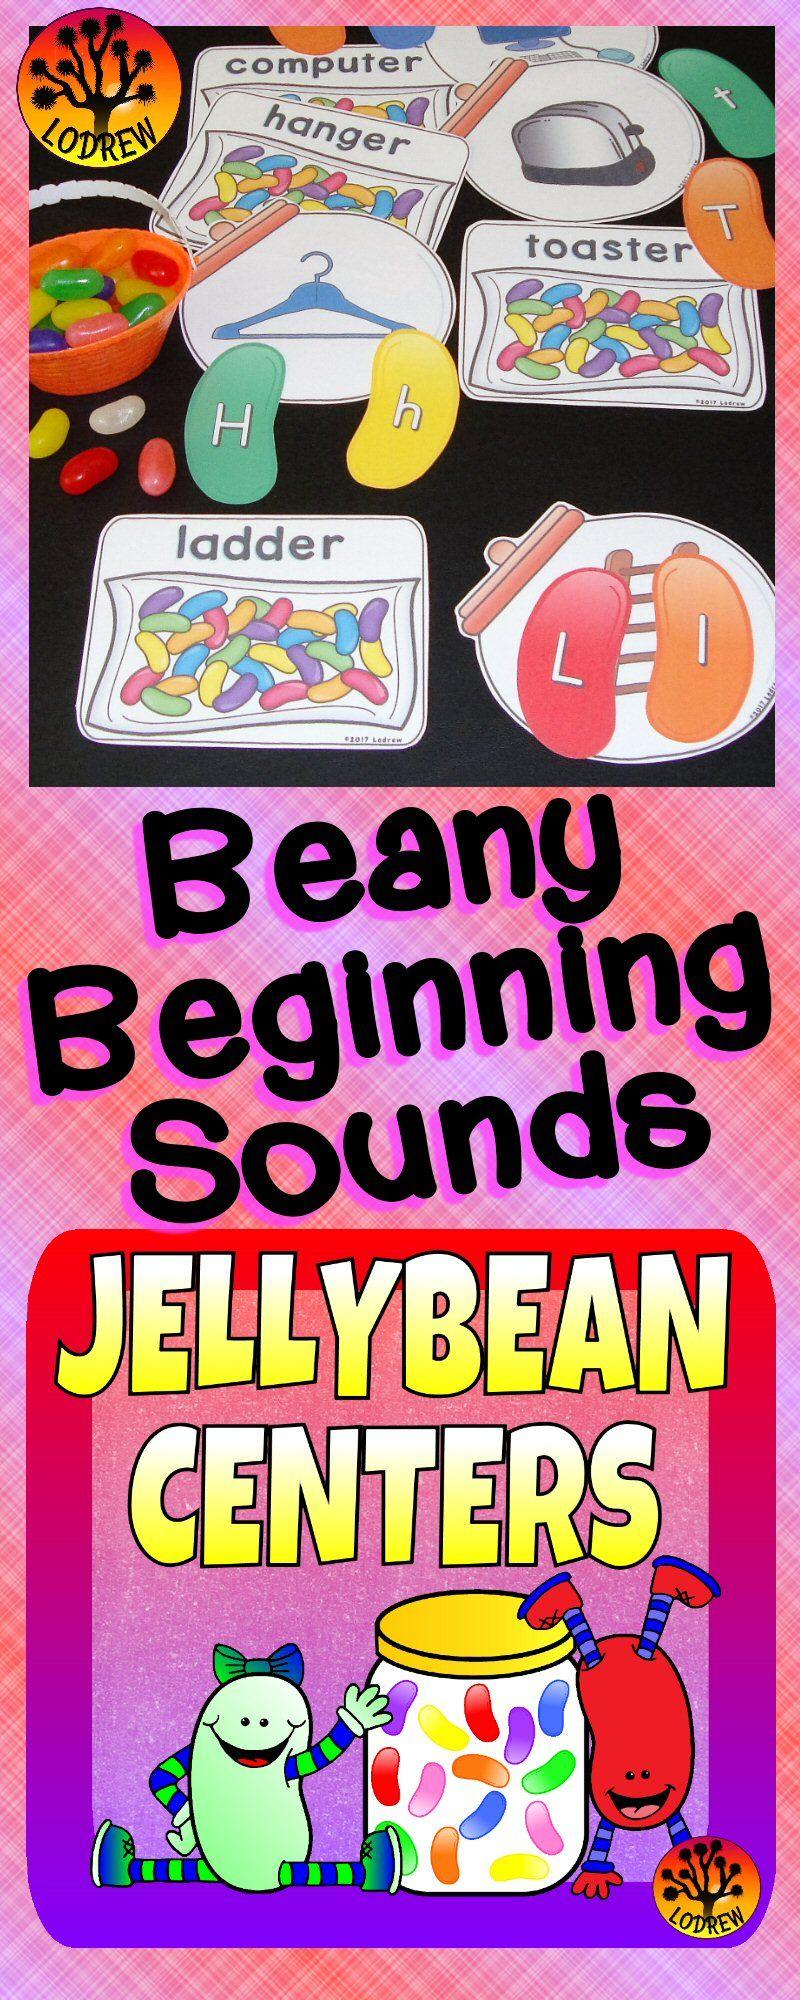 Jellybean Jelly Bean Centers Spring Activities Literacy Math Easter ...